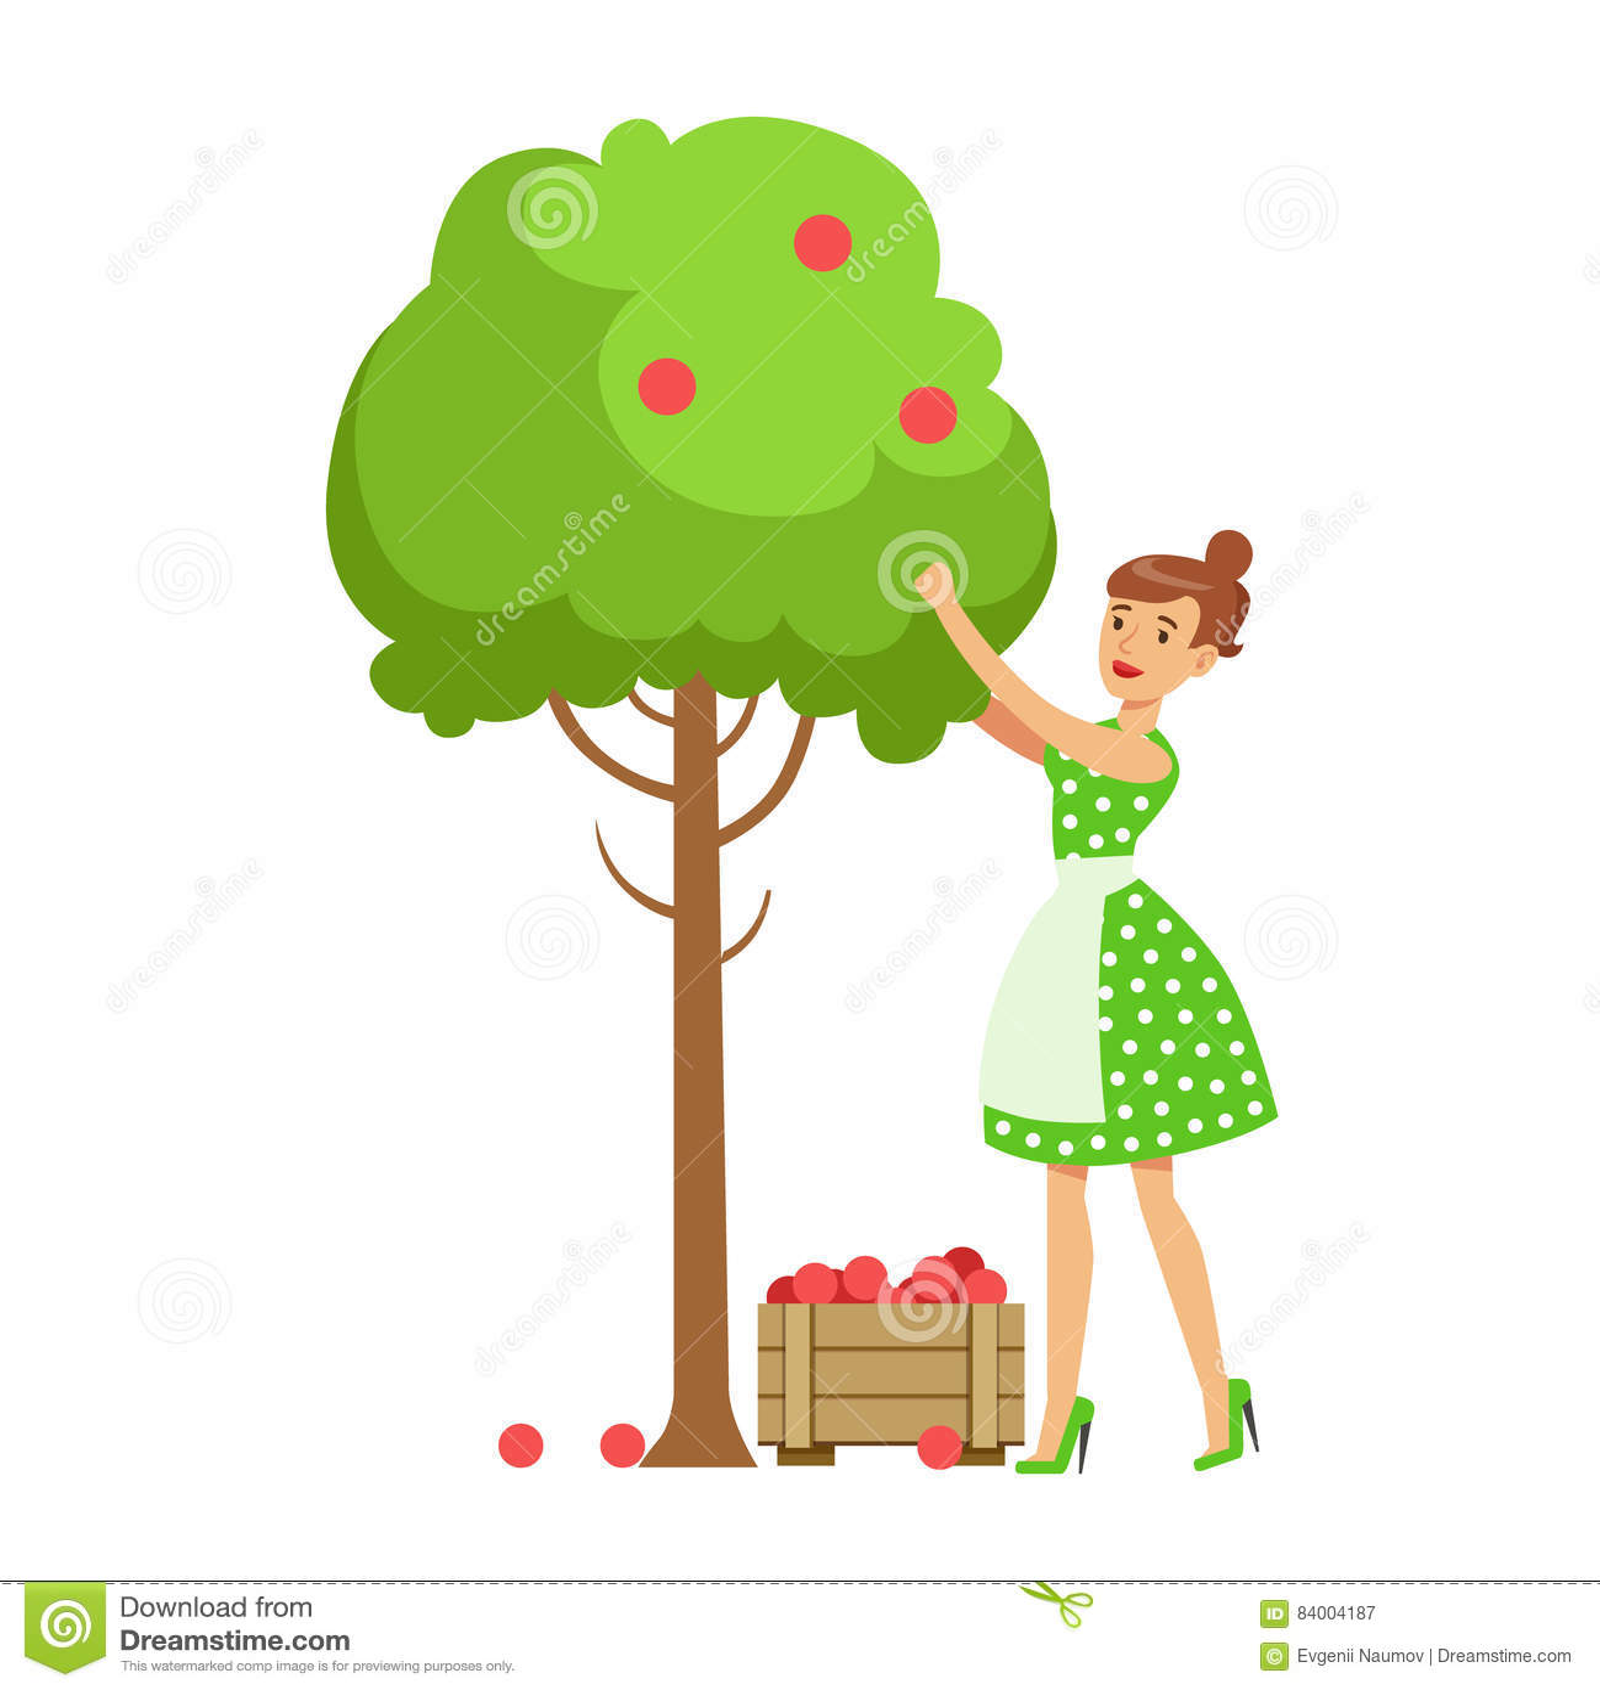 Picking Apples Stock Illustrations – 183 Picking Apples Stock ...